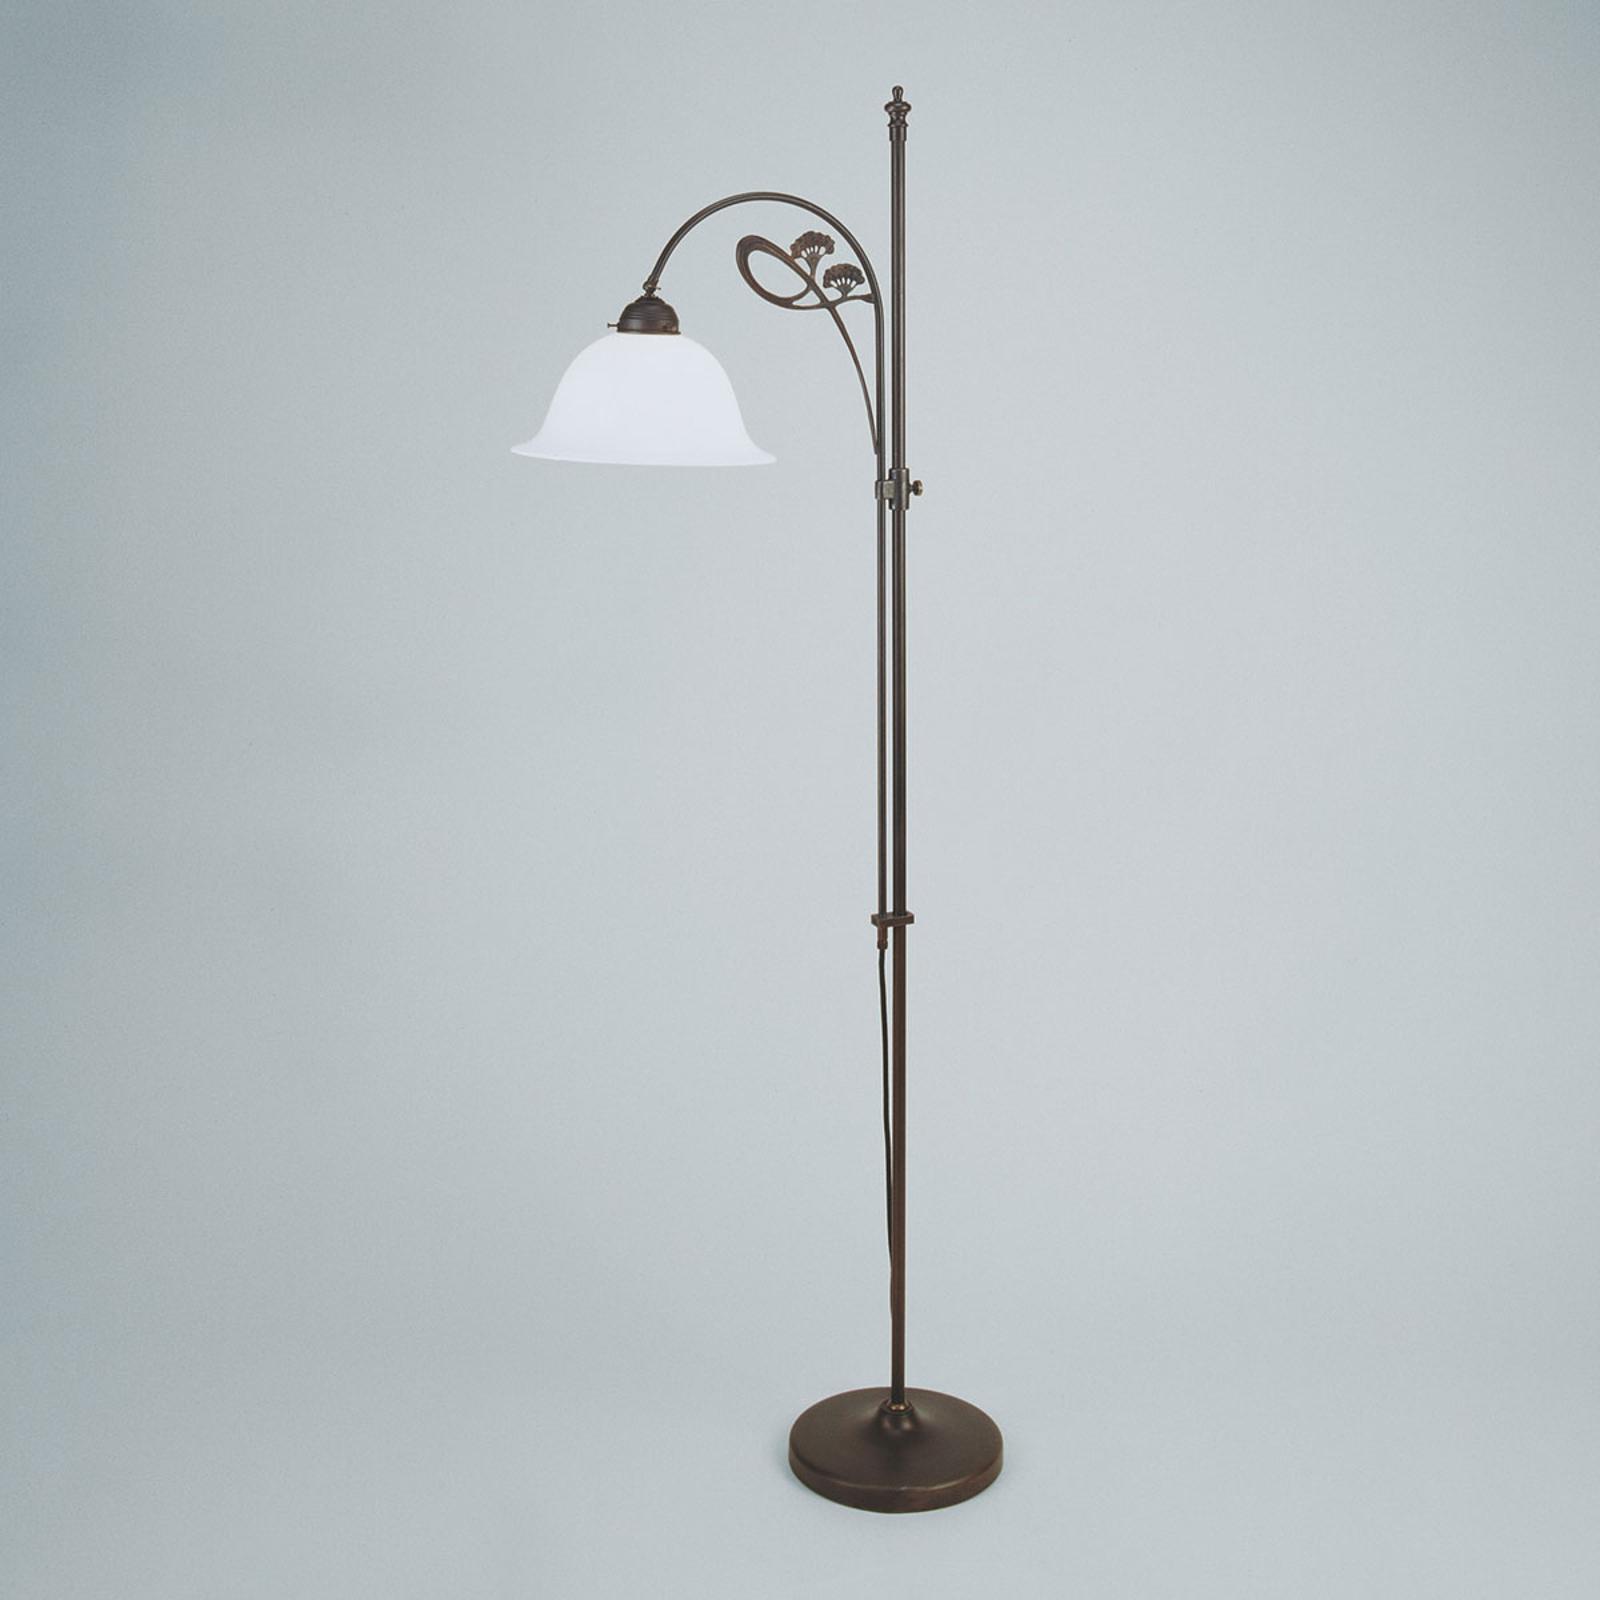 Subtiele vloerlamp Ilka, antieke kleurstelling